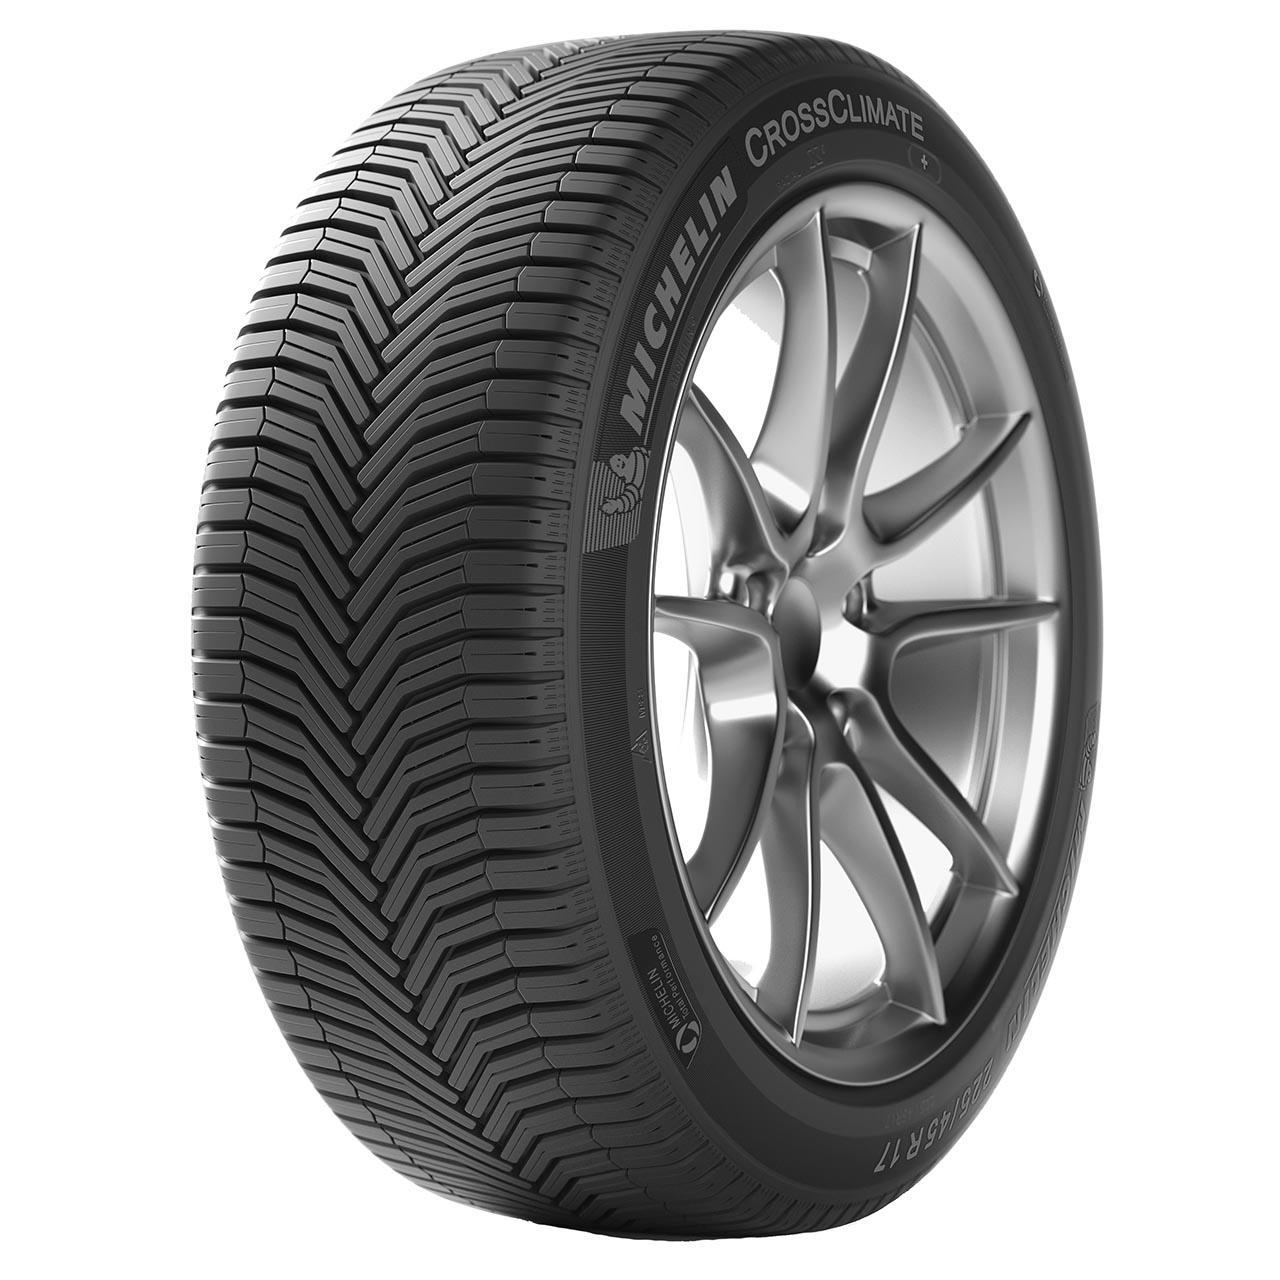 Michelin Crossclimate Plus 195/65R15 95V XL